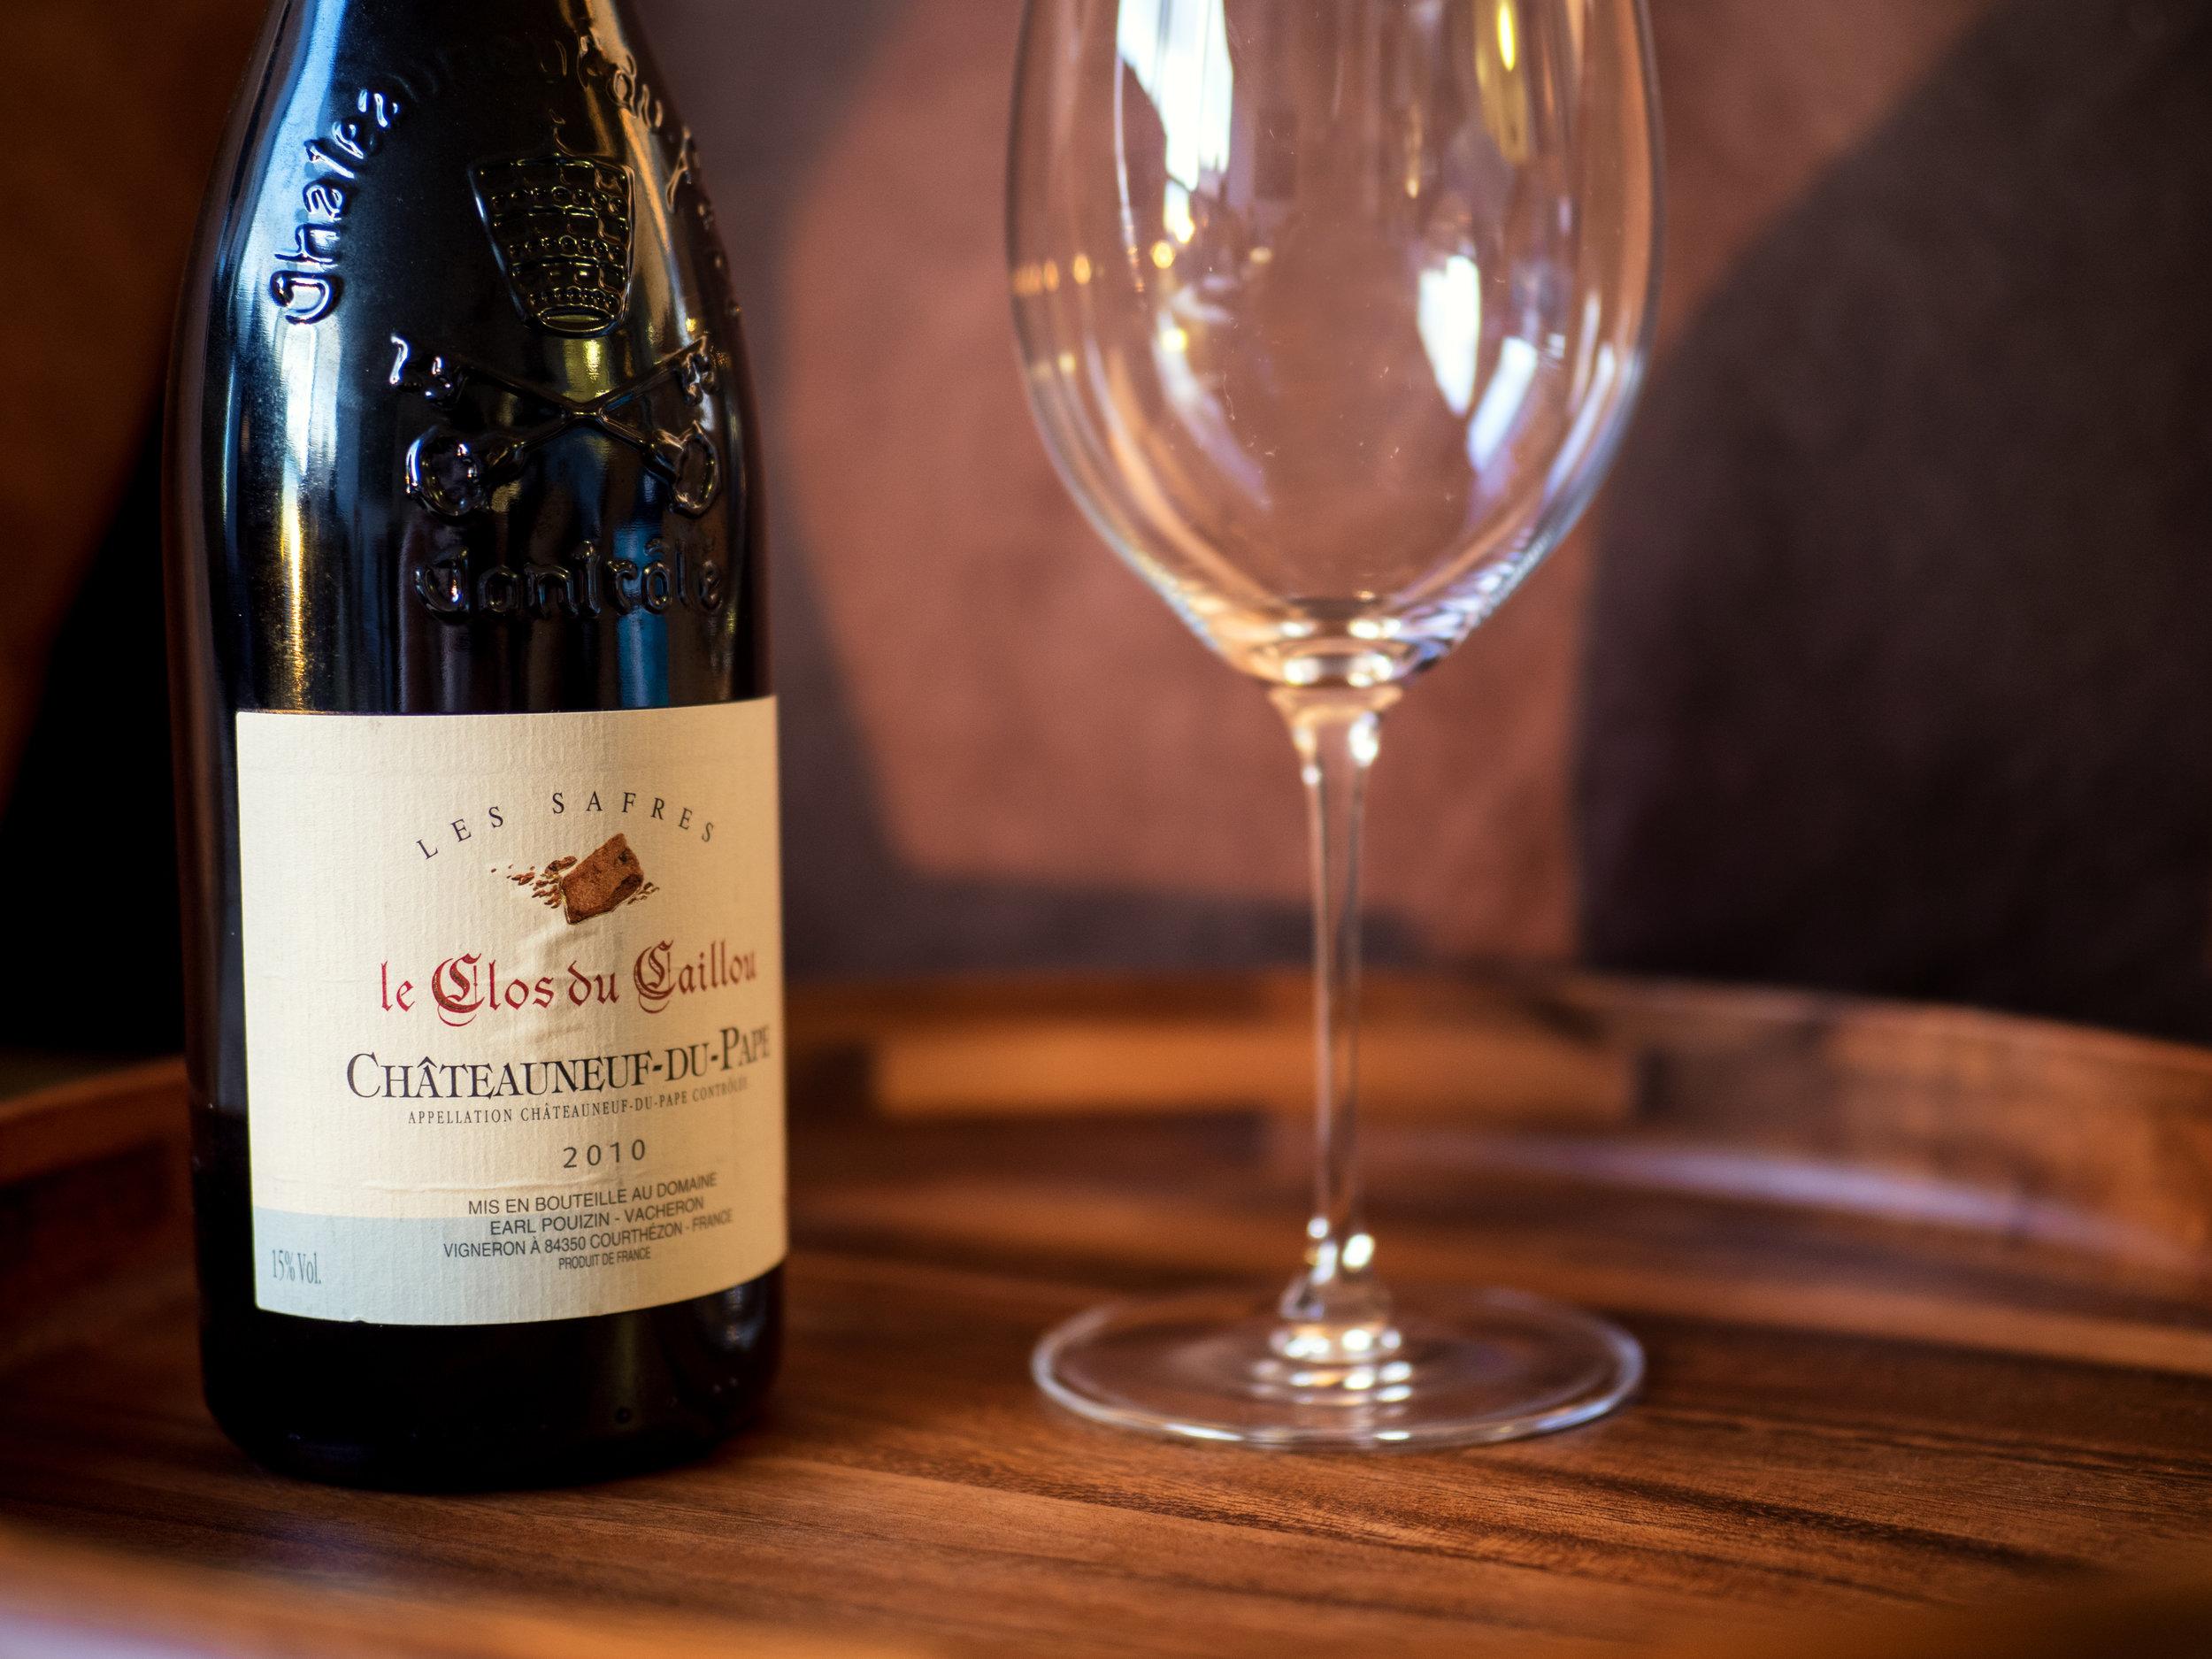 Vinous Label Elucidation - Decoding Southern Rhone Valley Wine Labels - Chateauneuf-du-pape